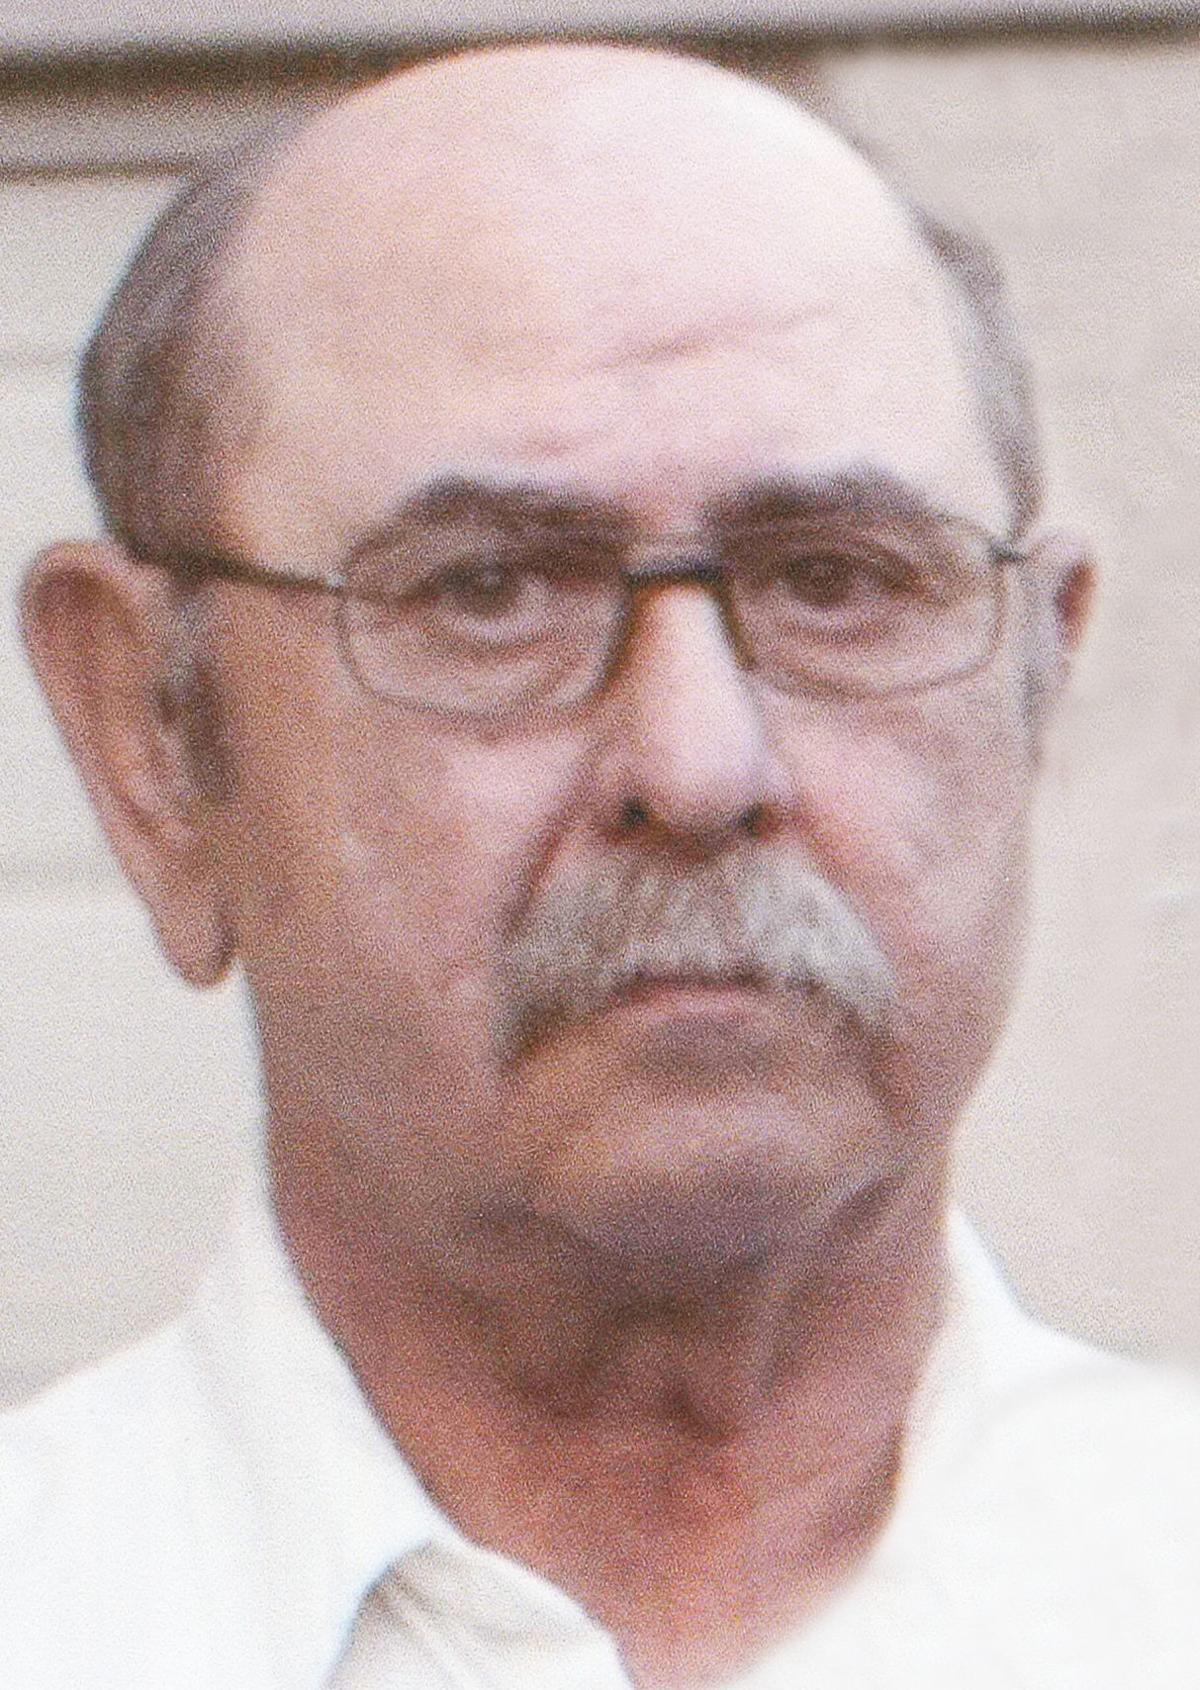 Donald Petzoldt